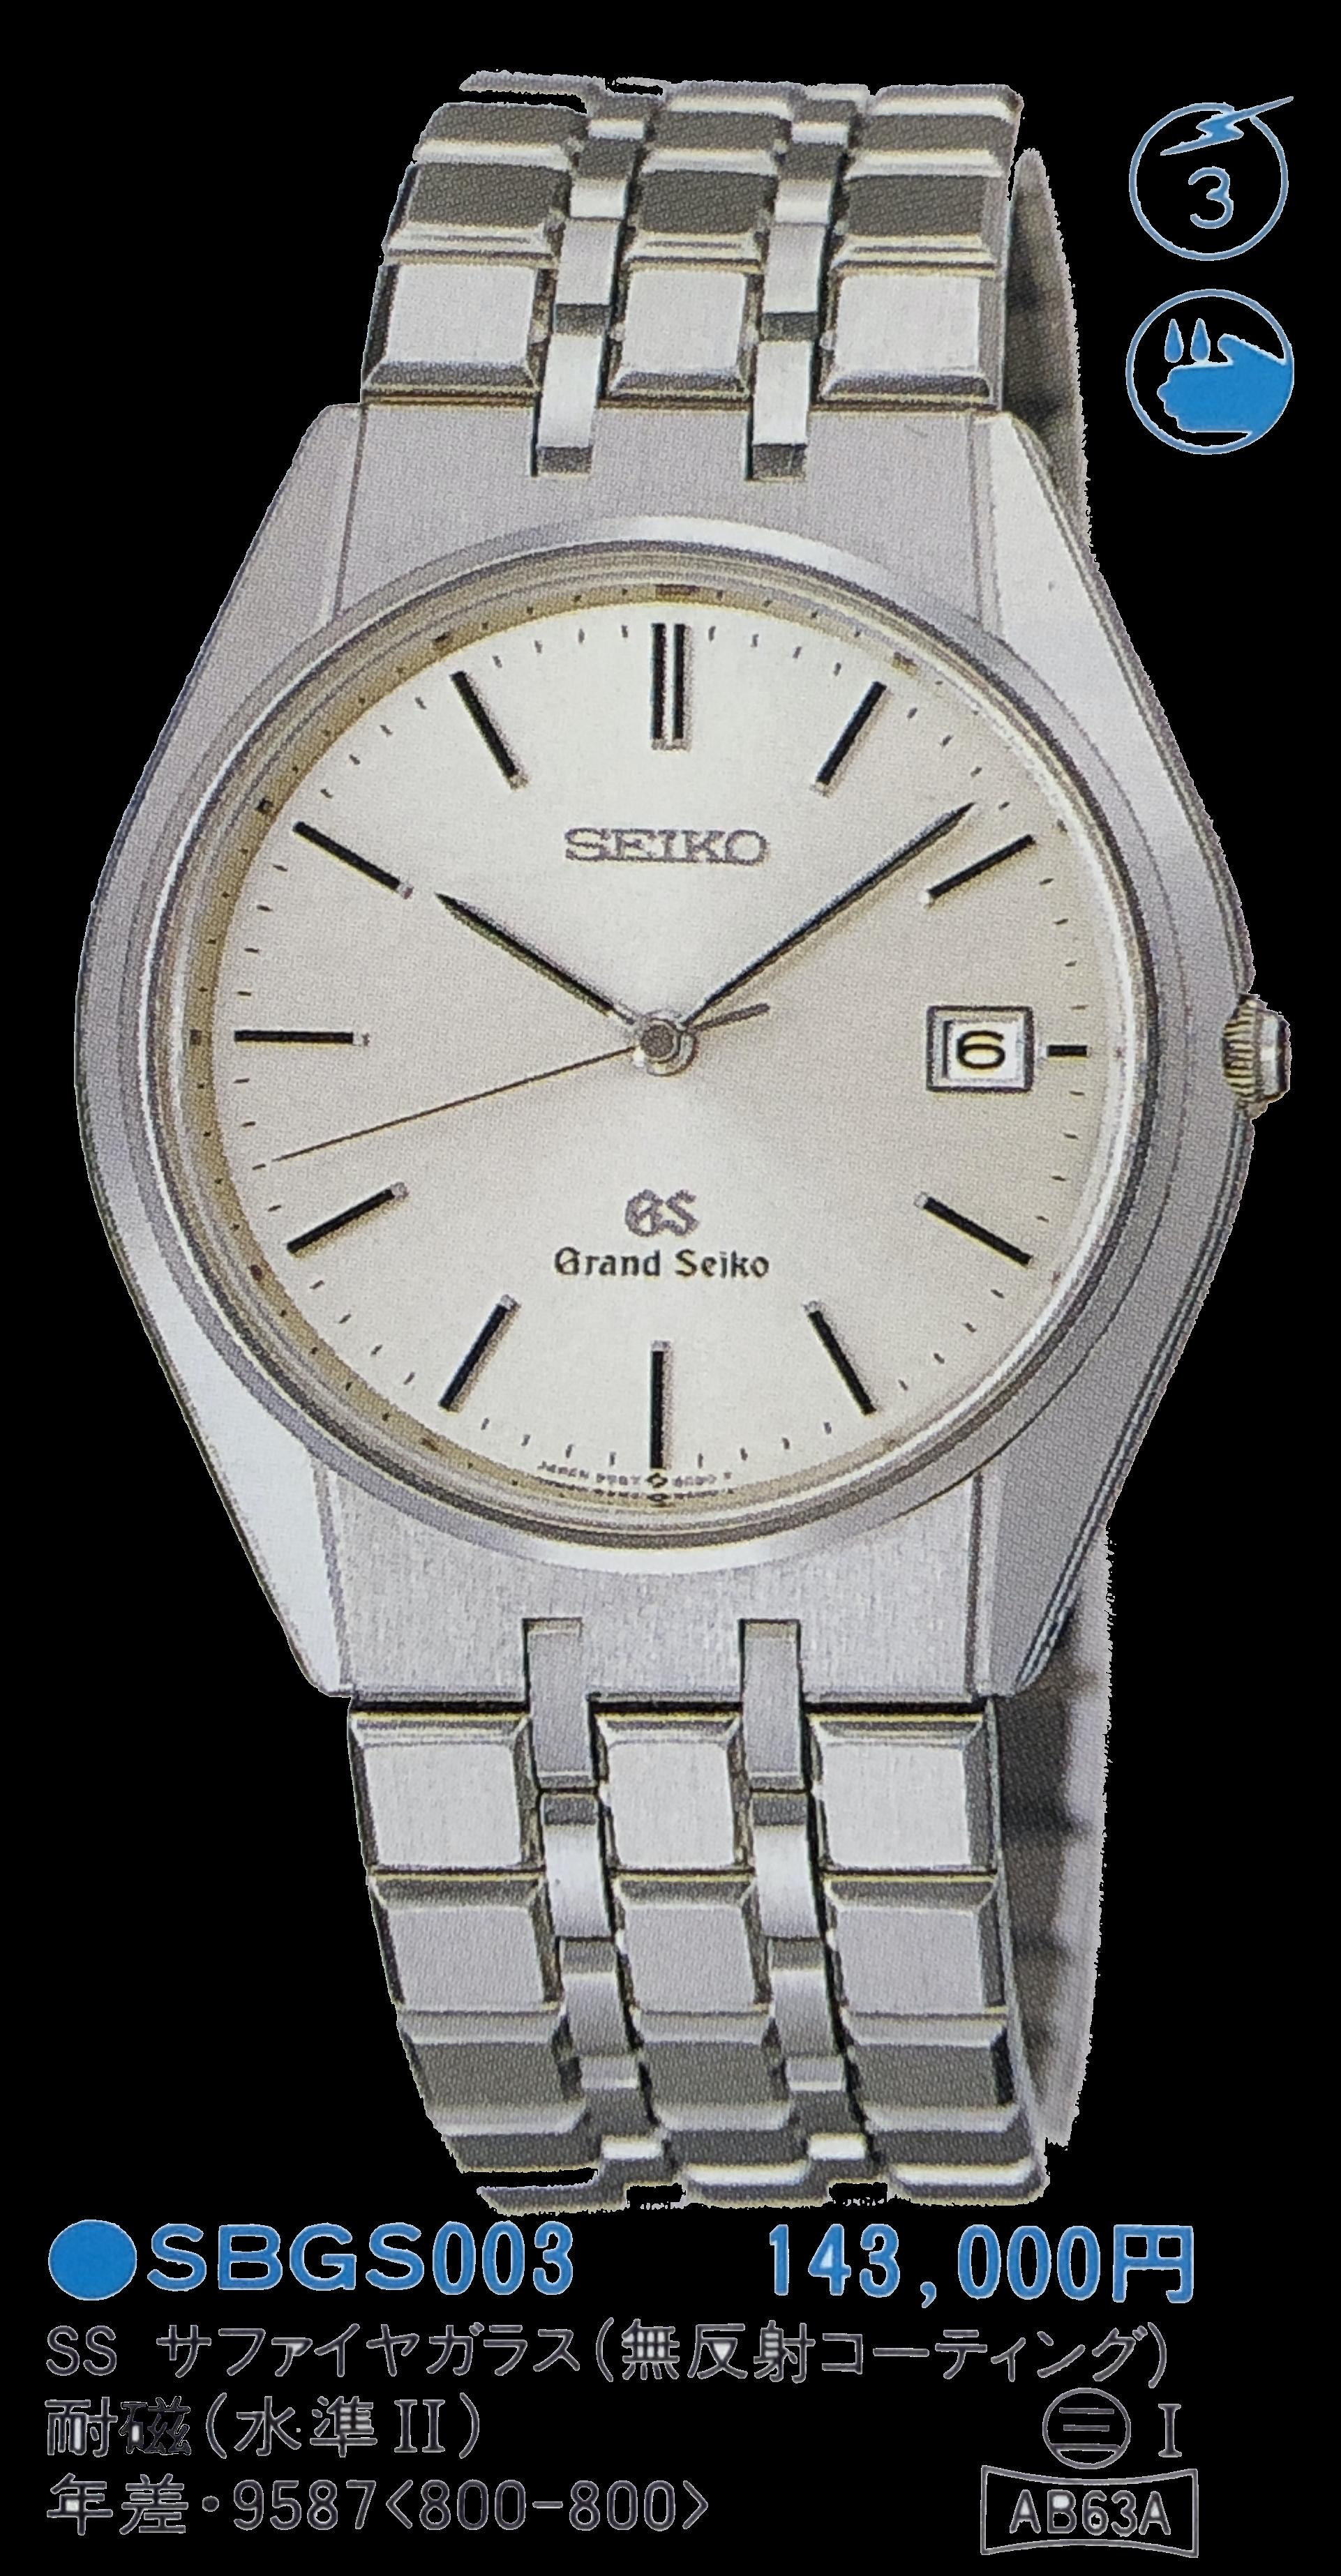 Grand Seiko 9587